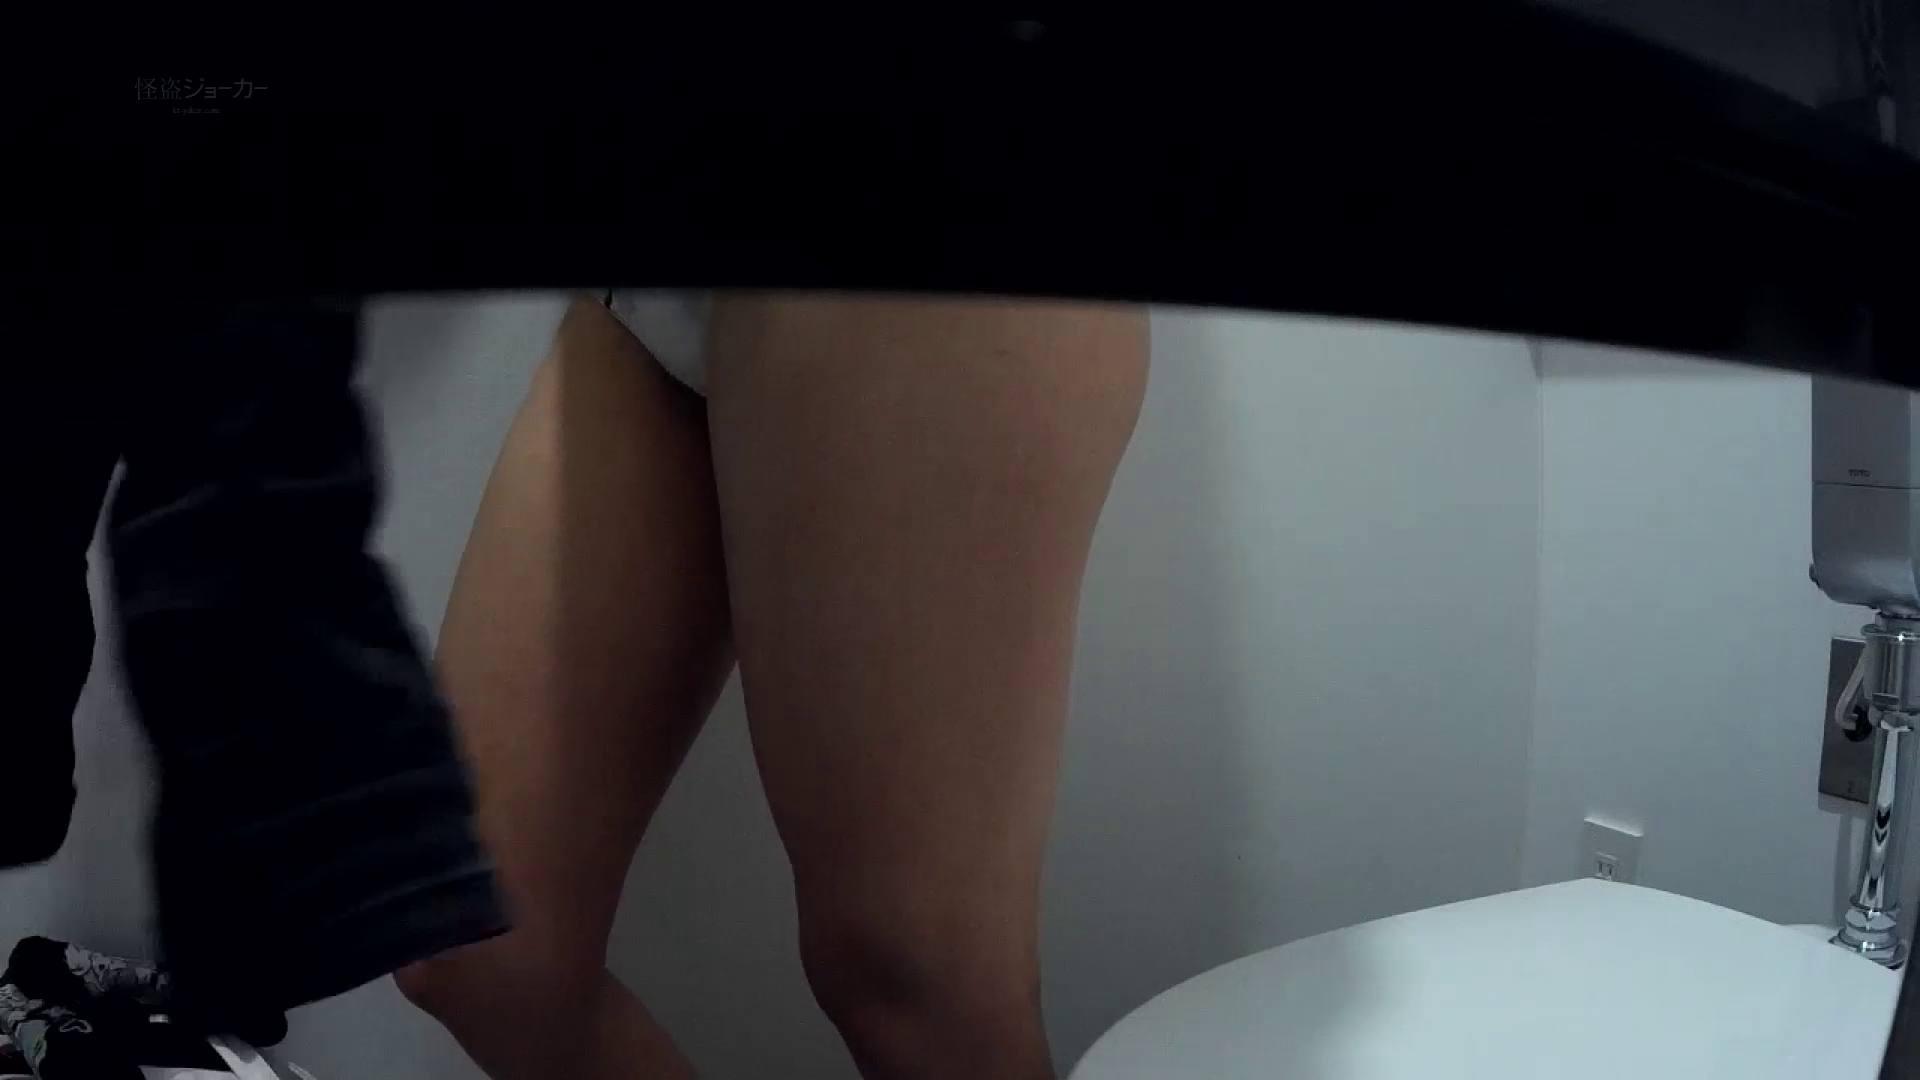 有名大学女性洗面所 vol.54 設置撮影最高峰!! 3視点でじっくり観察 洗面所 SEX無修正画像 76画像 36